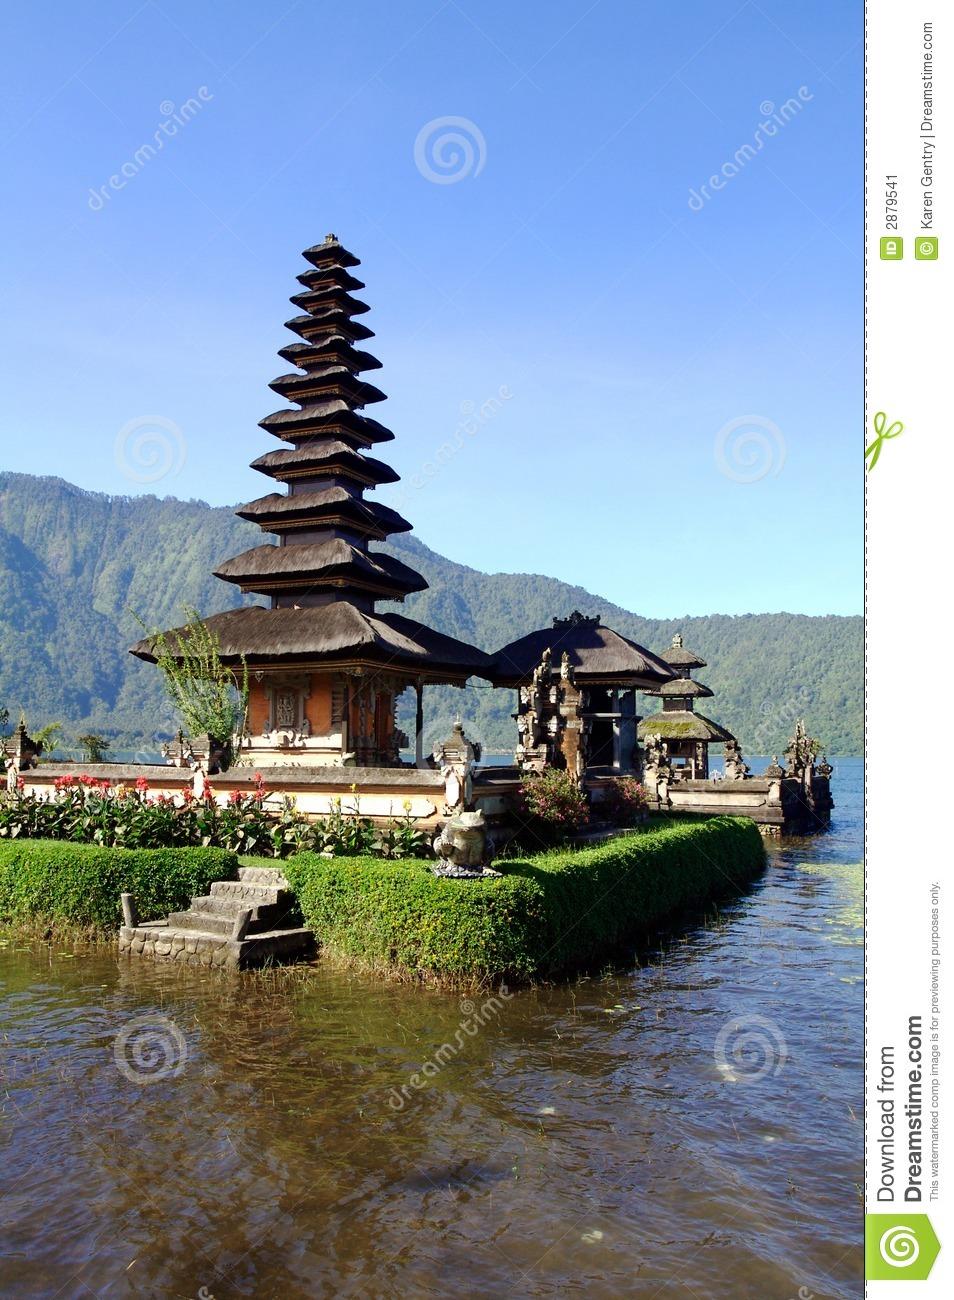 Bali Water Temple Vertical Stock Image.